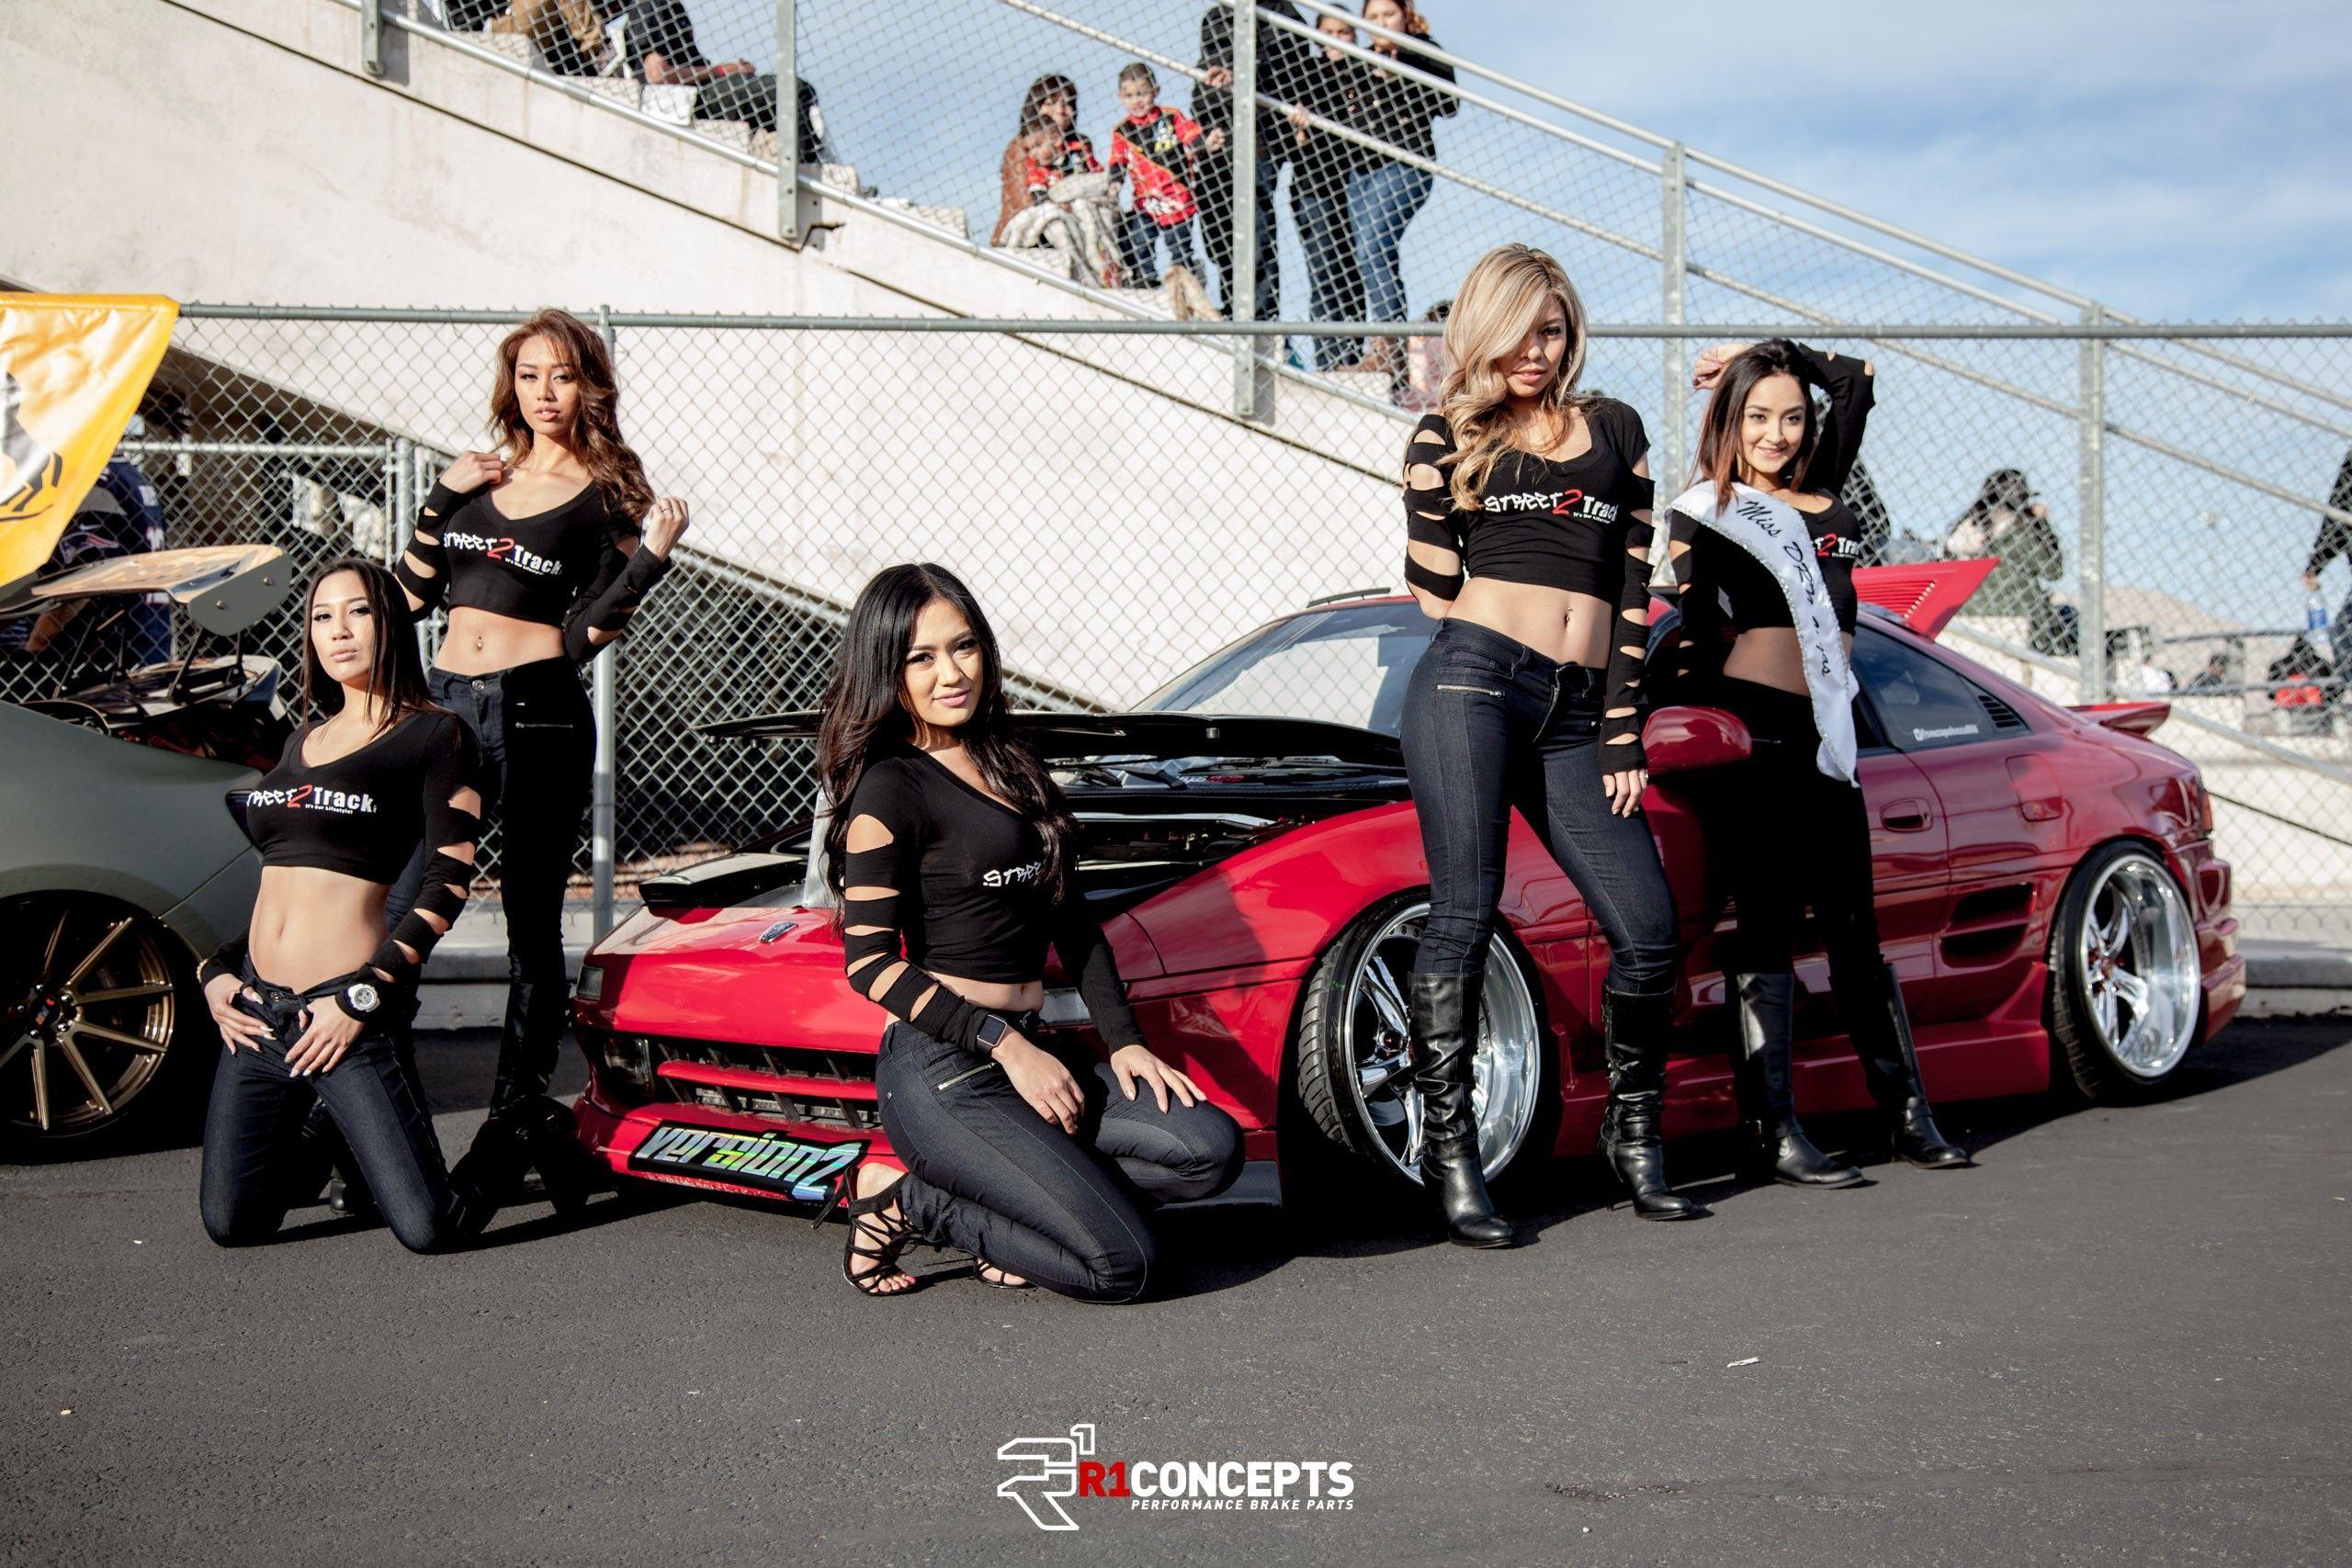 StreetTrack Drag Racing Nationals Las Vegas NV Coverage - Lowrider car show las vegas